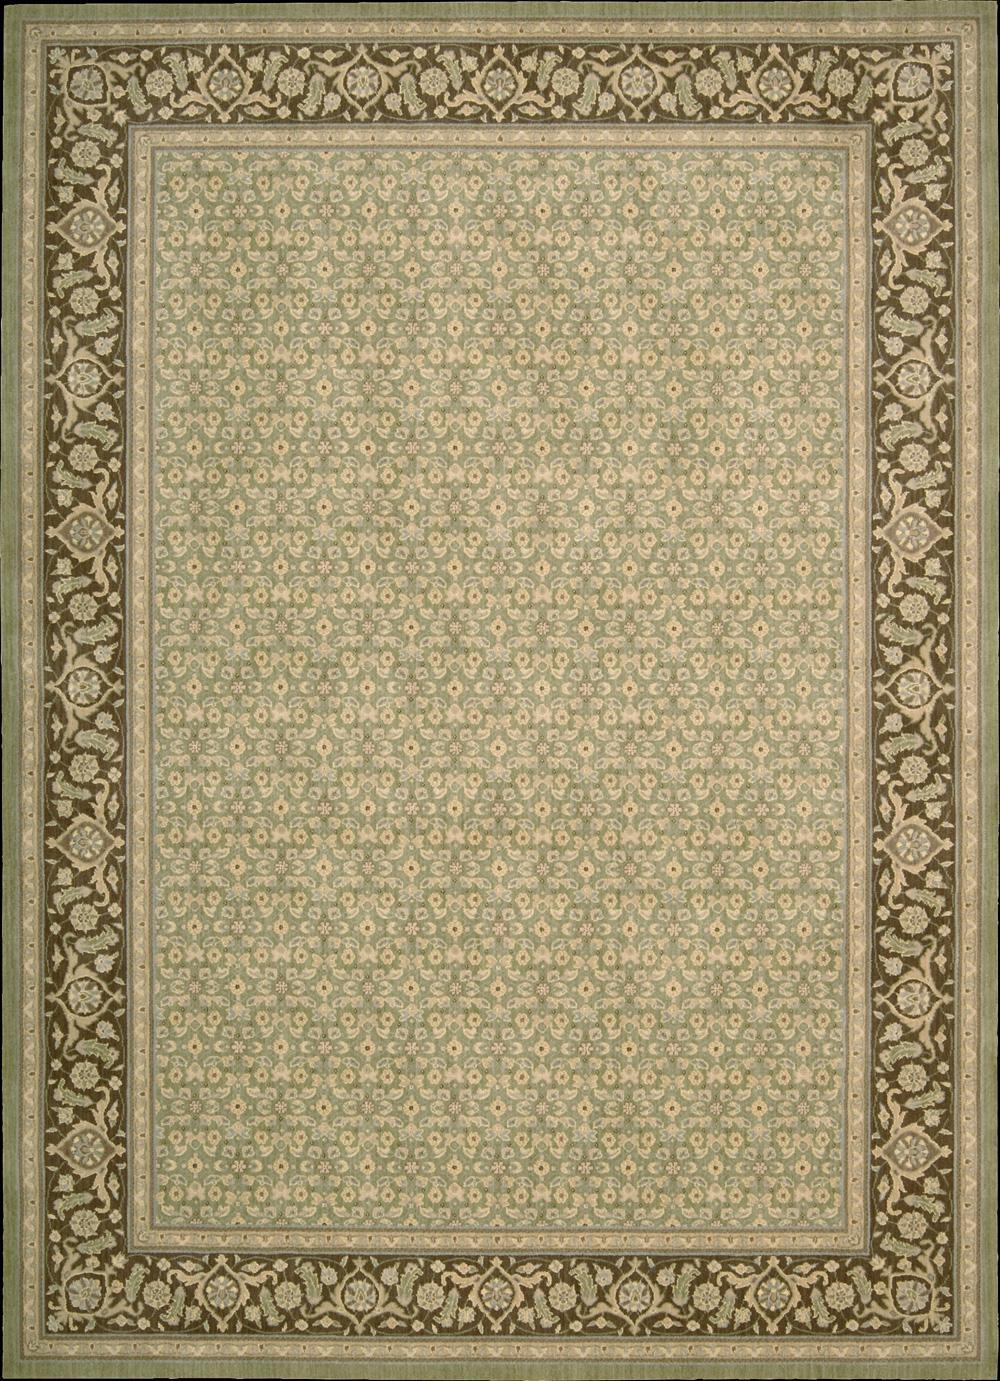 "Nourison Persian Empire Area Rug 5'3"" x 7'5"" - Item Number: 44256"